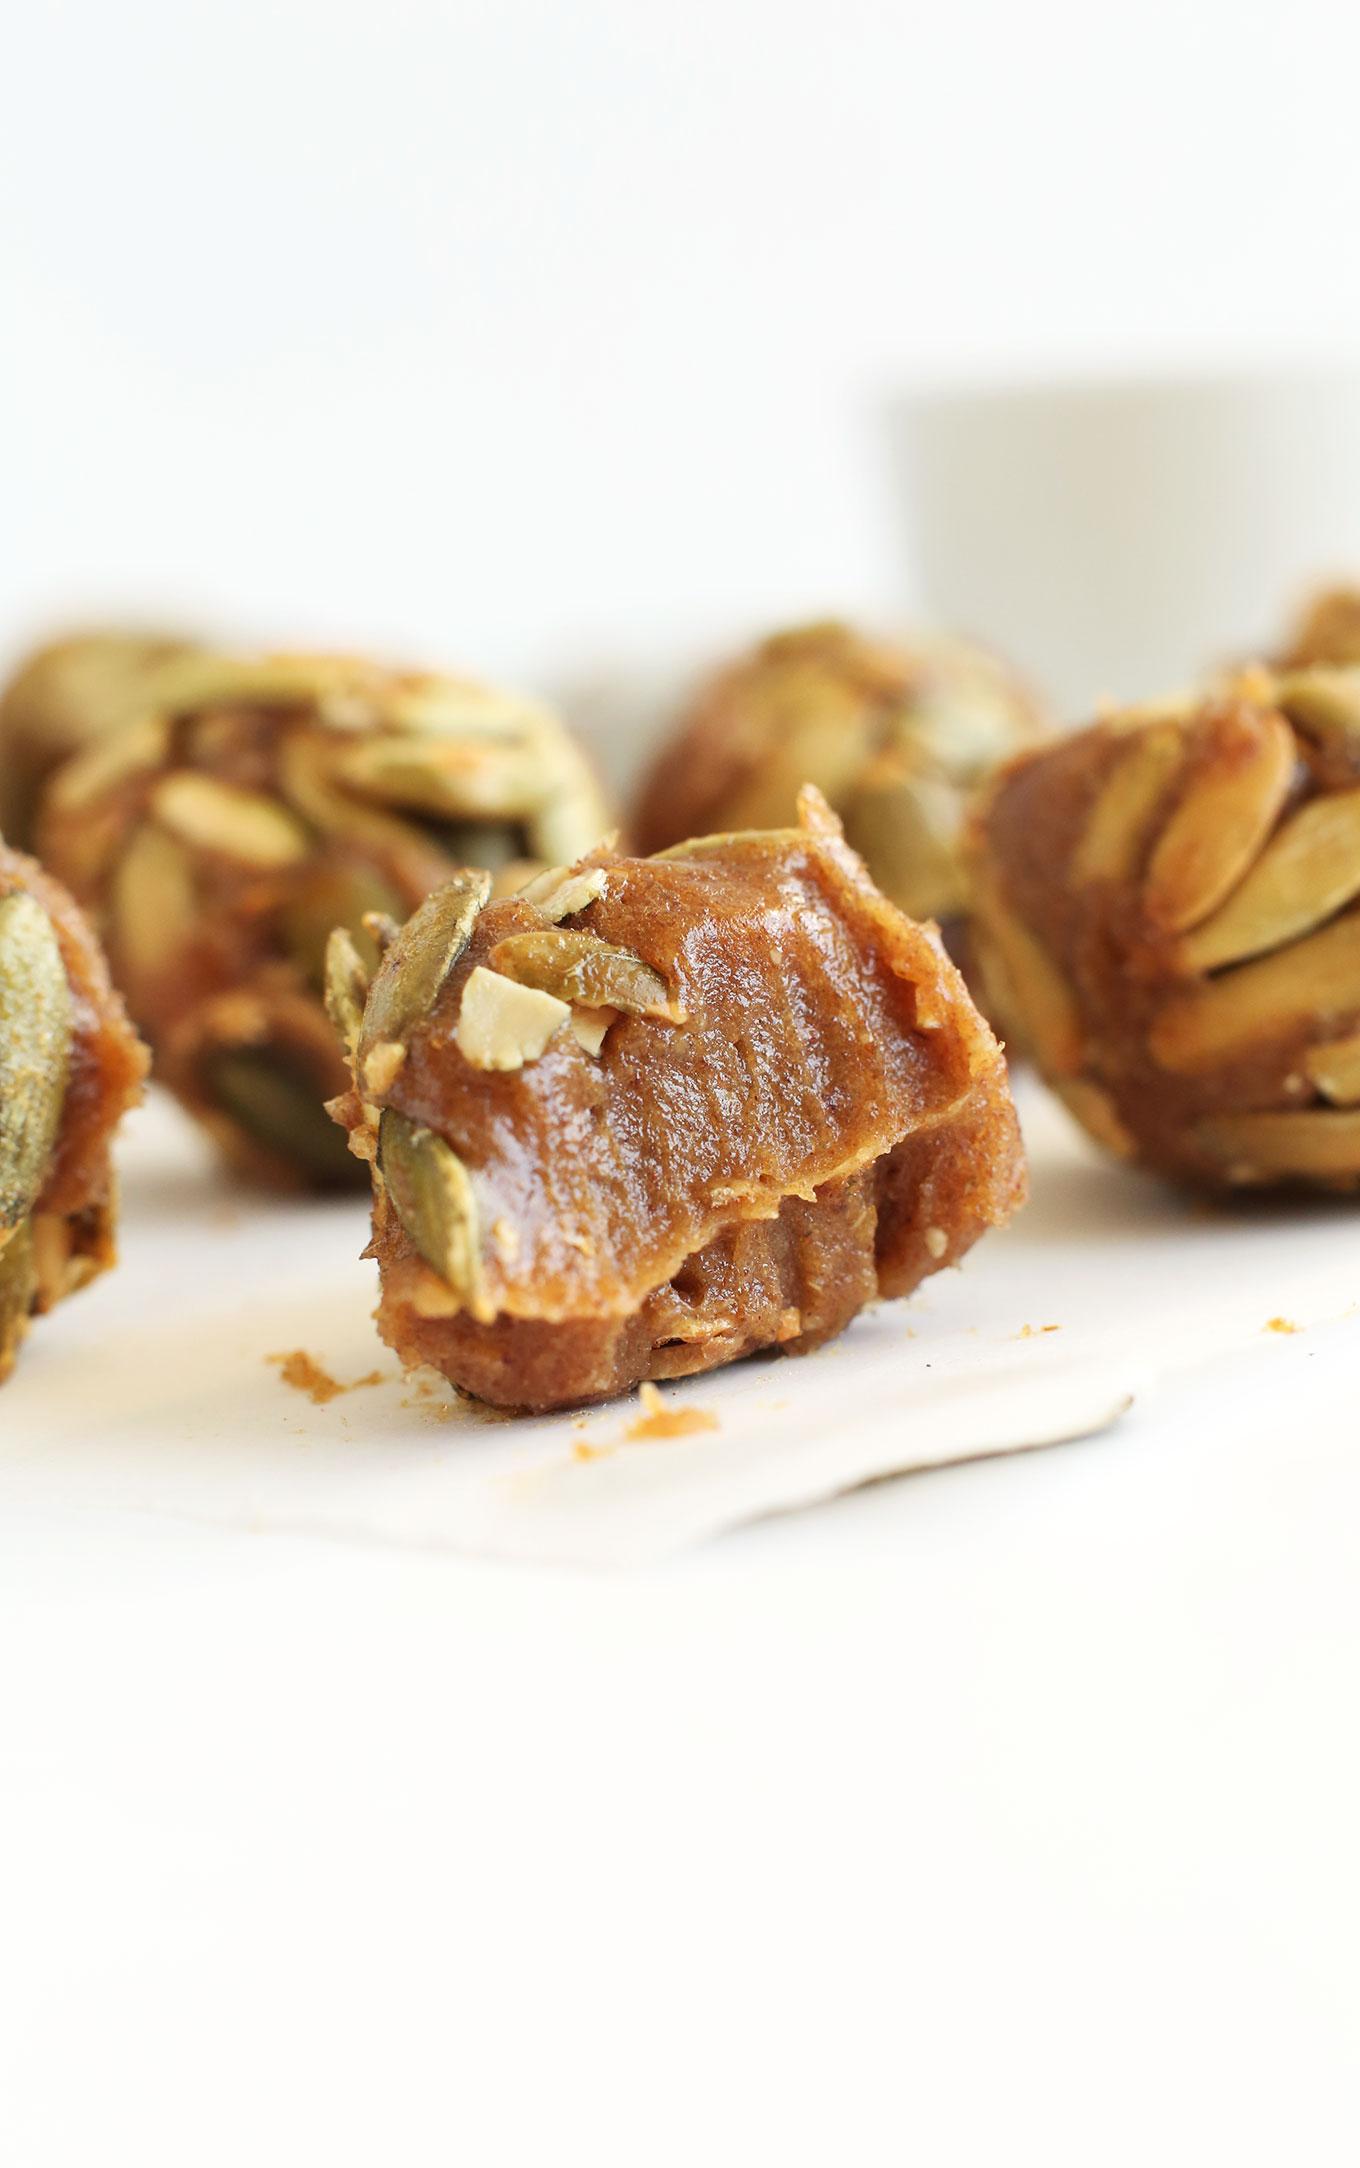 Showing the inside of a date-sweetened vegan Pumpkin Caramel